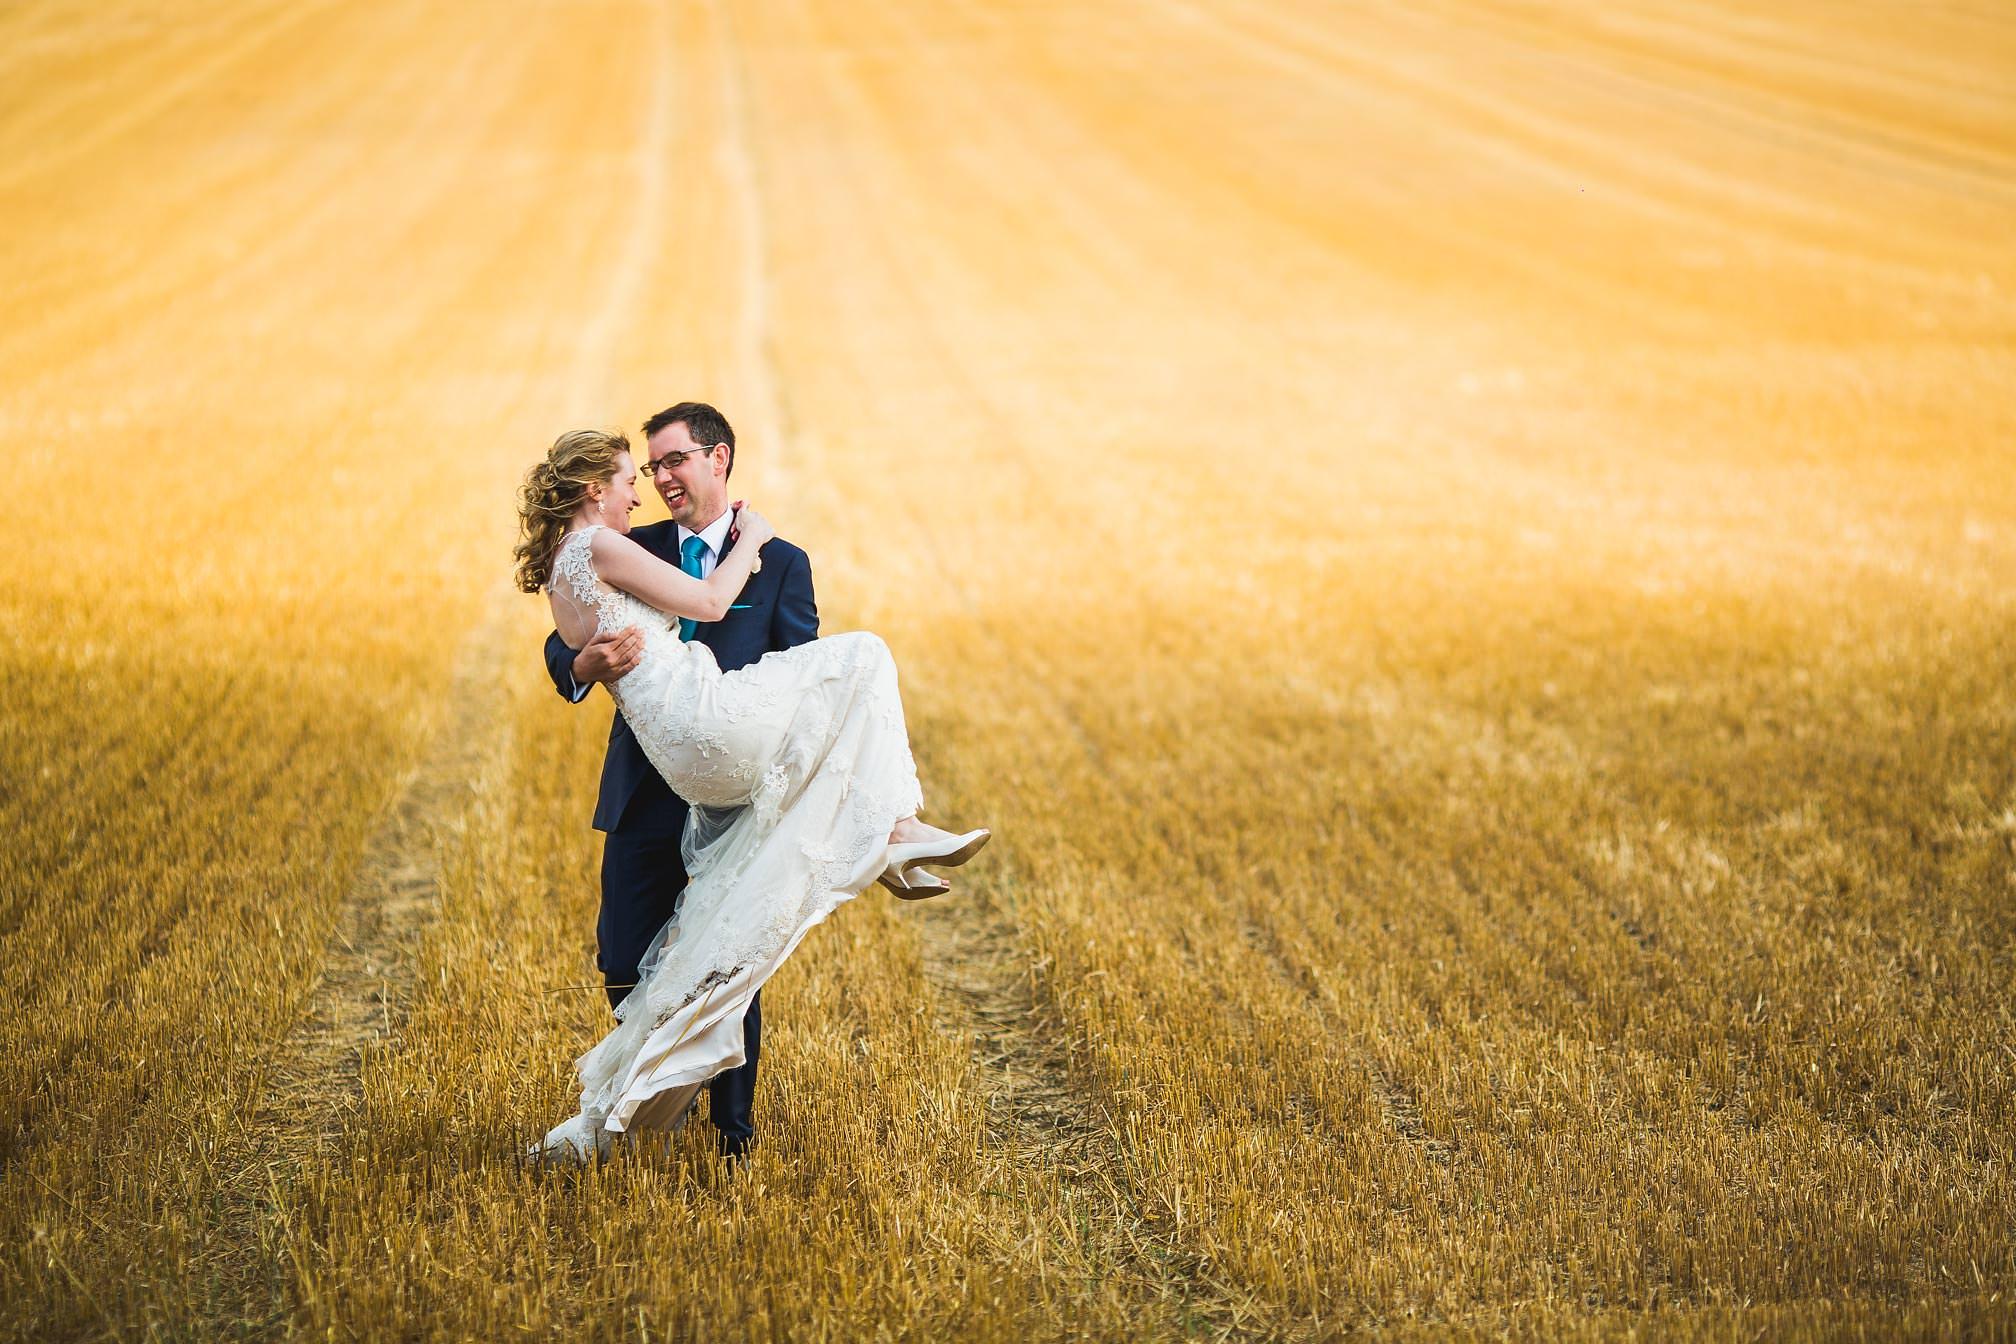 Rangefinder Magazine 30 Rising Stars of Wedding Photography 2016 - 19